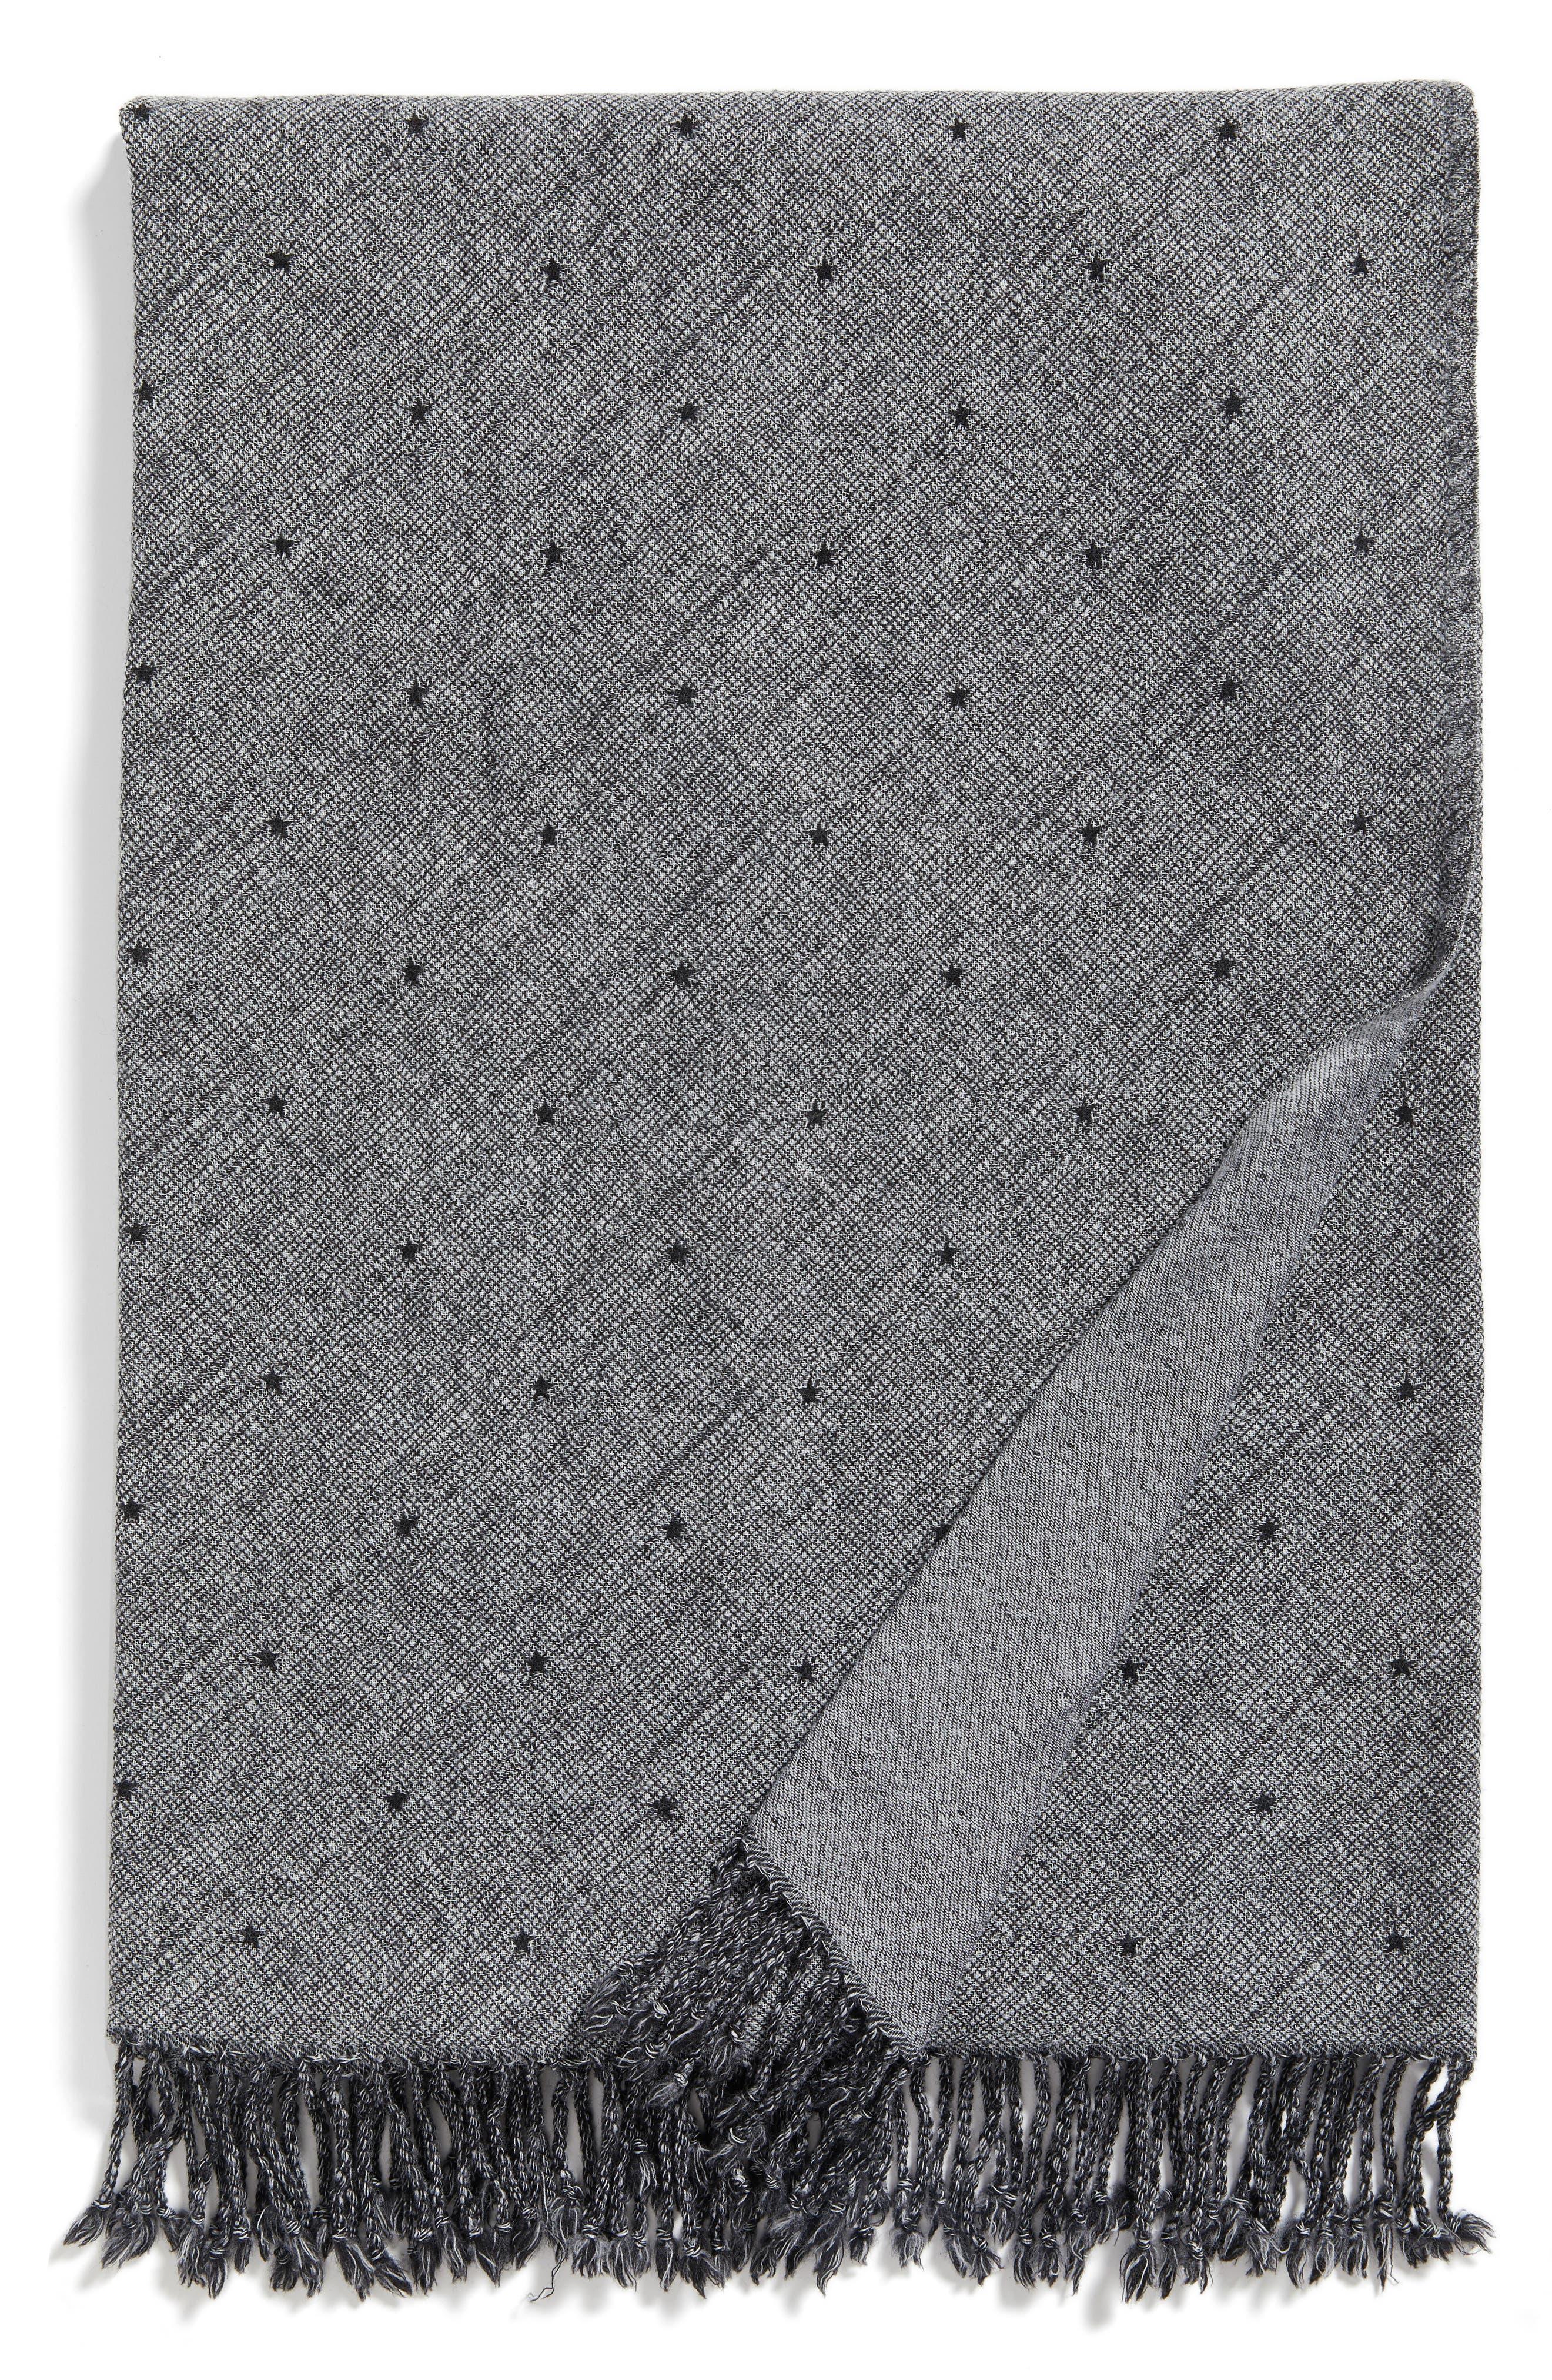 Blackstar Double Face Merino Wool Throw,                         Main,                         color, Blackstar